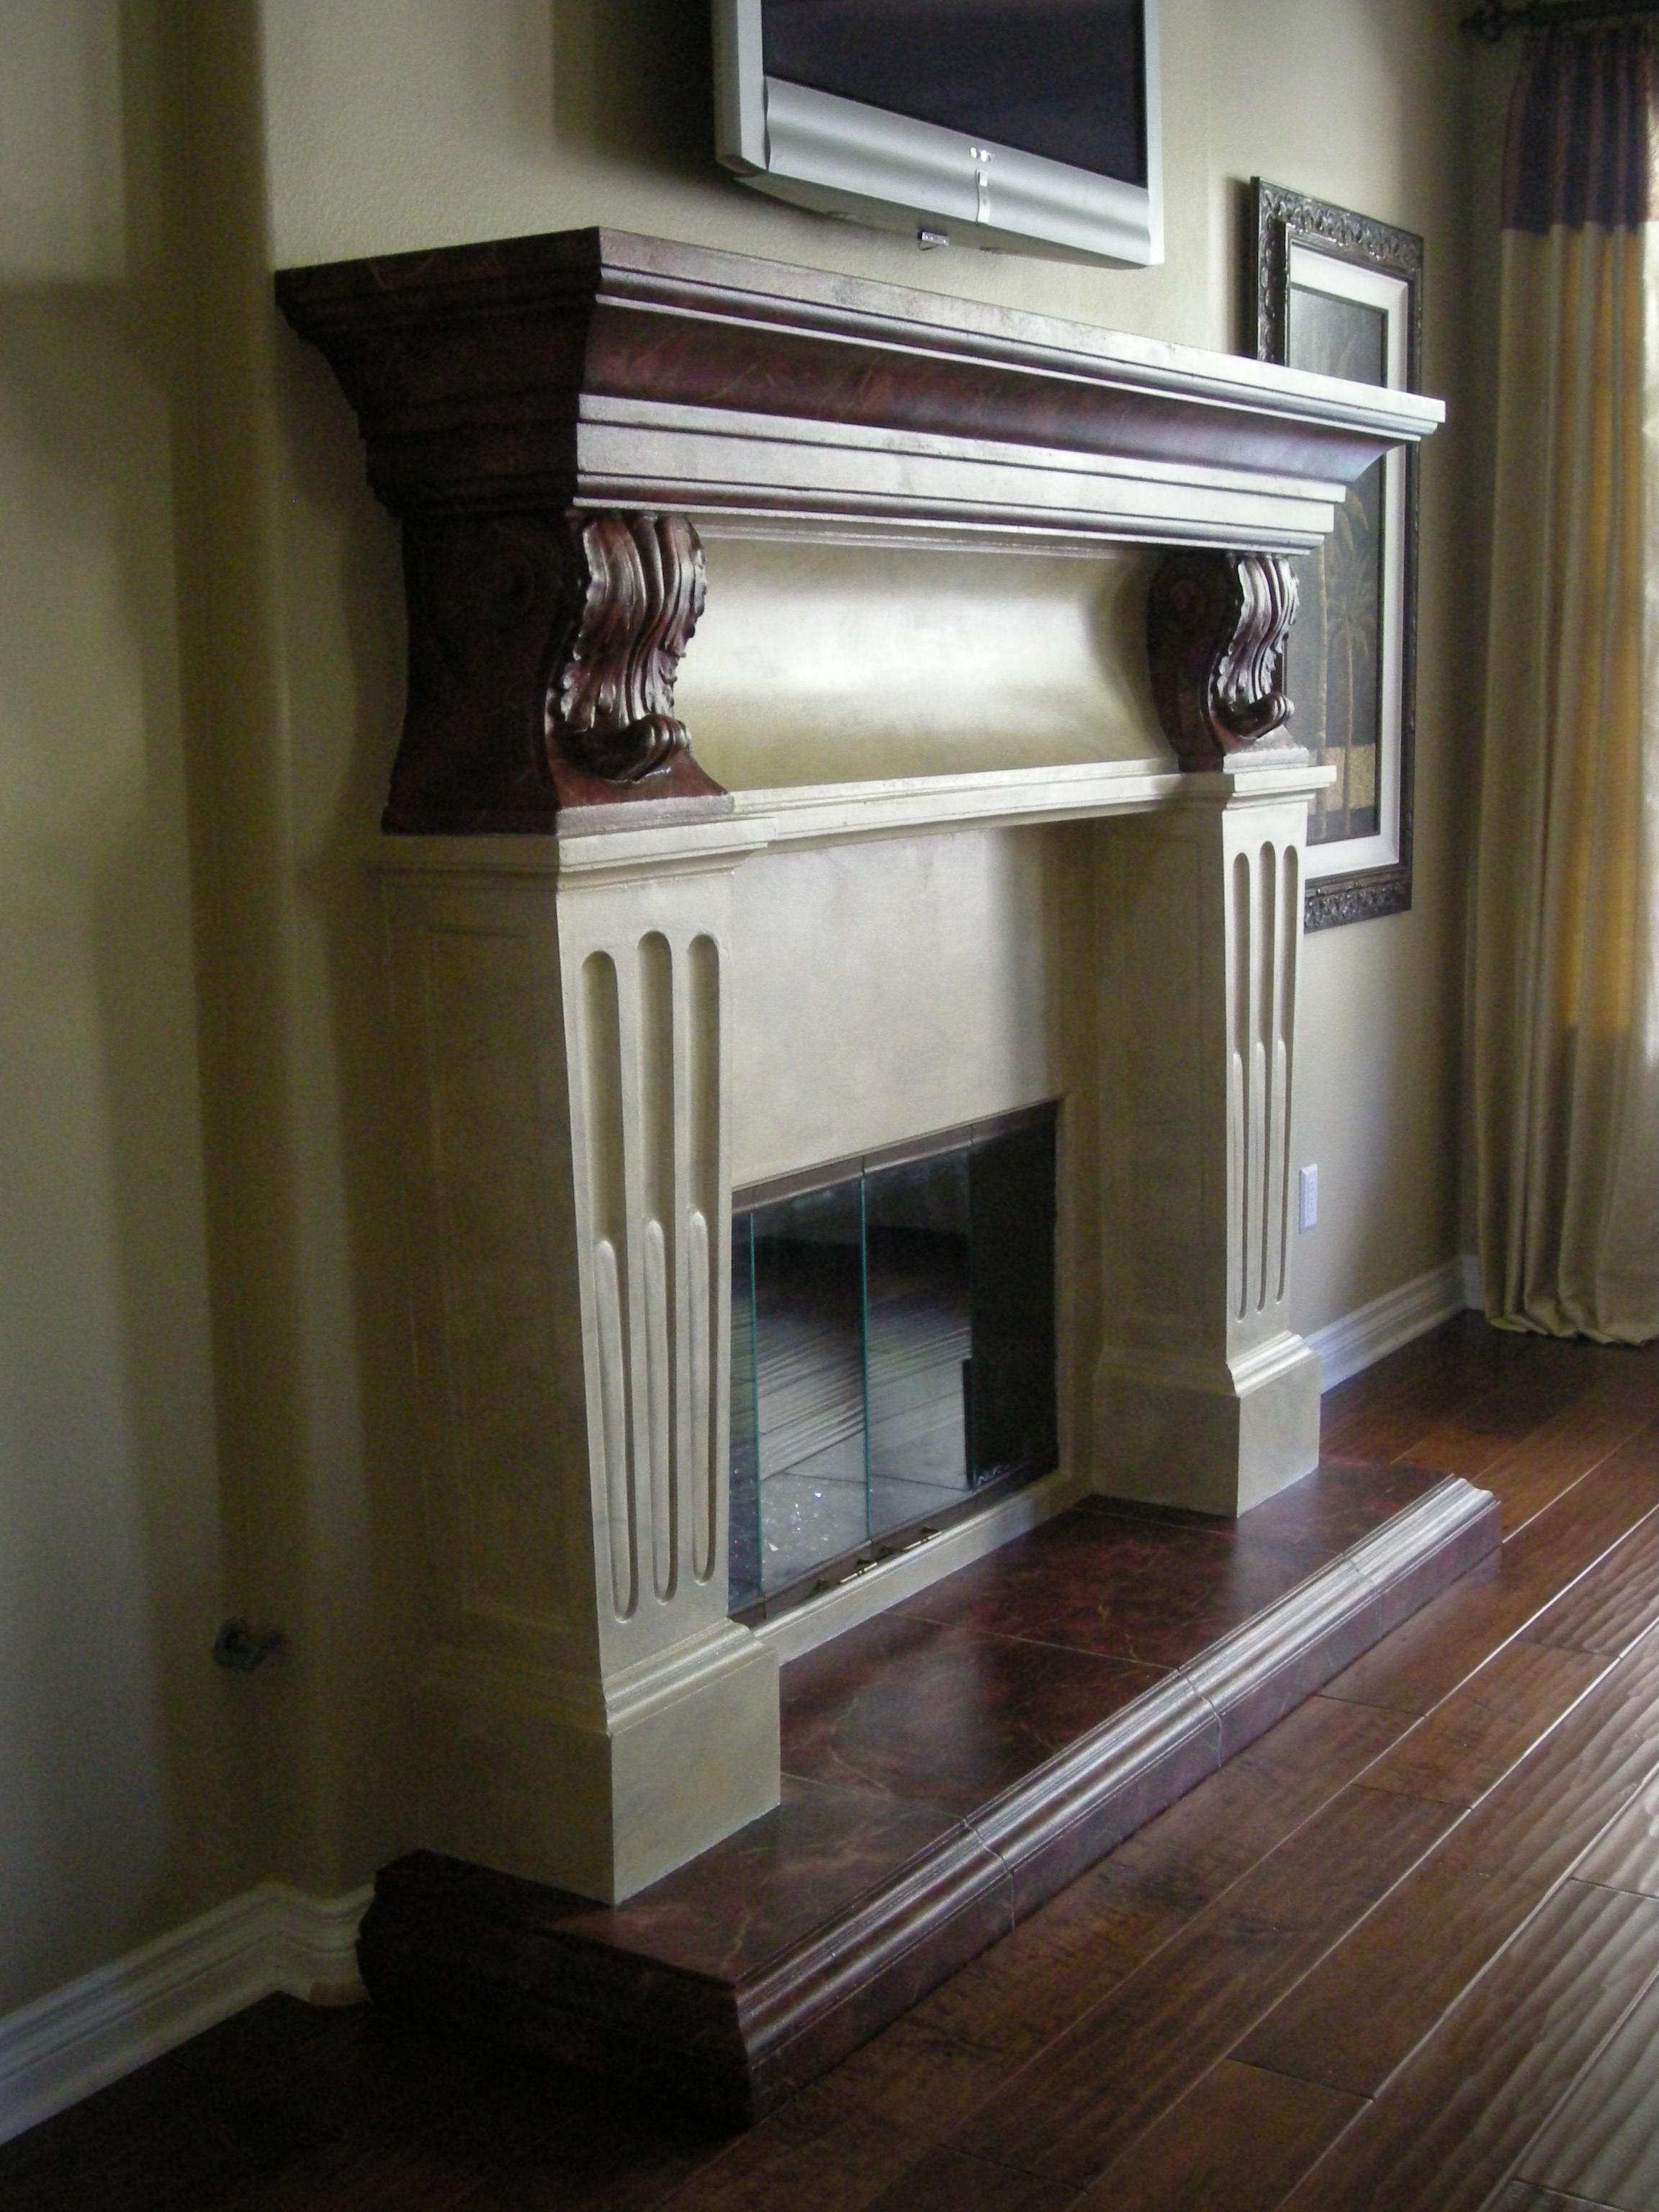 Diprima_fireplaces_004.jpg